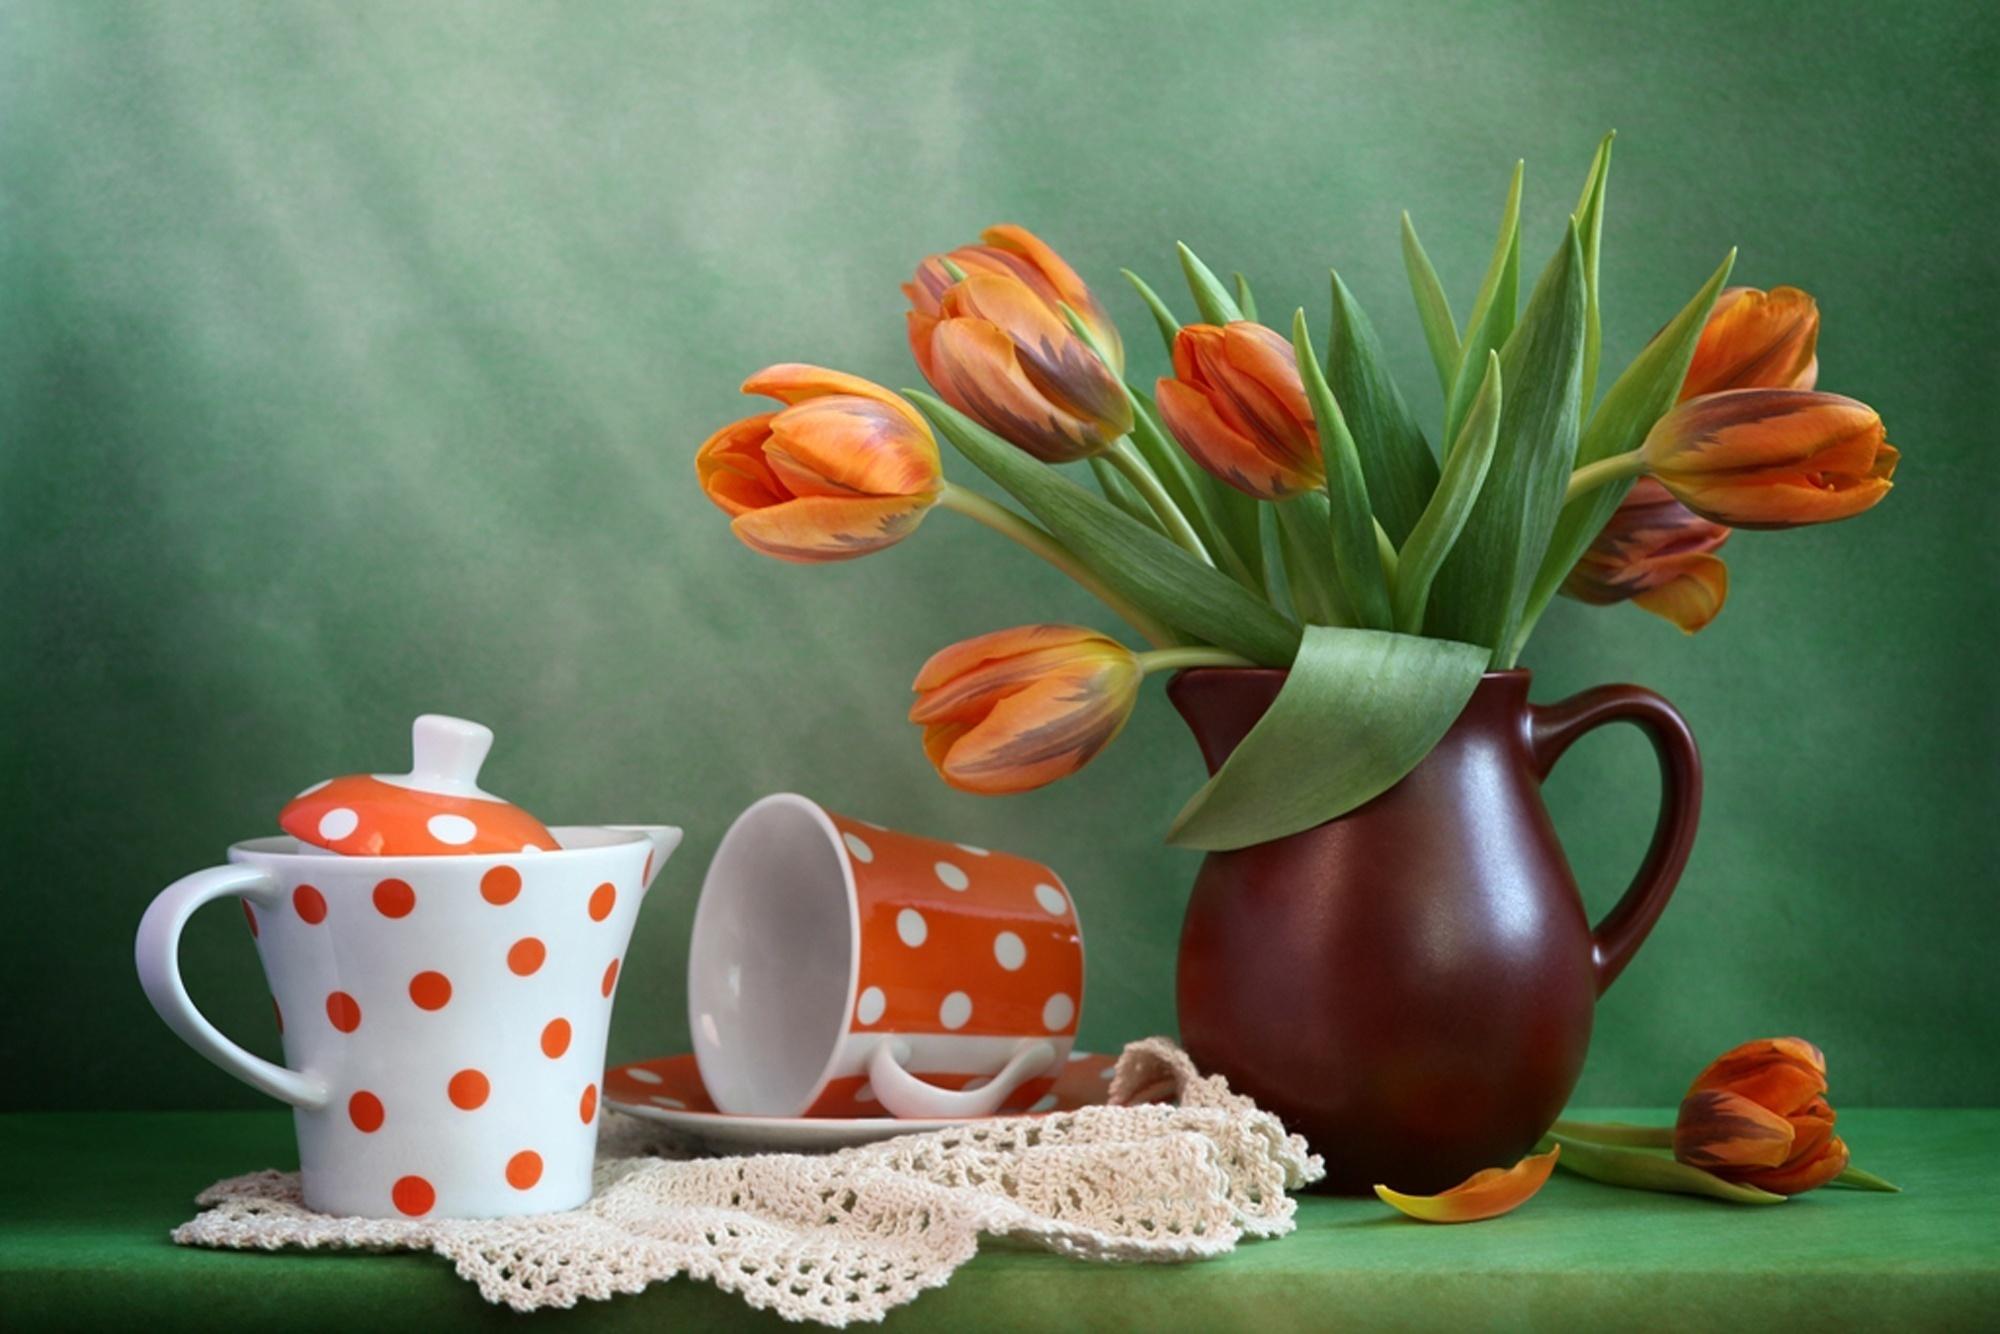 линолеума картинки чашки натюрморт будни